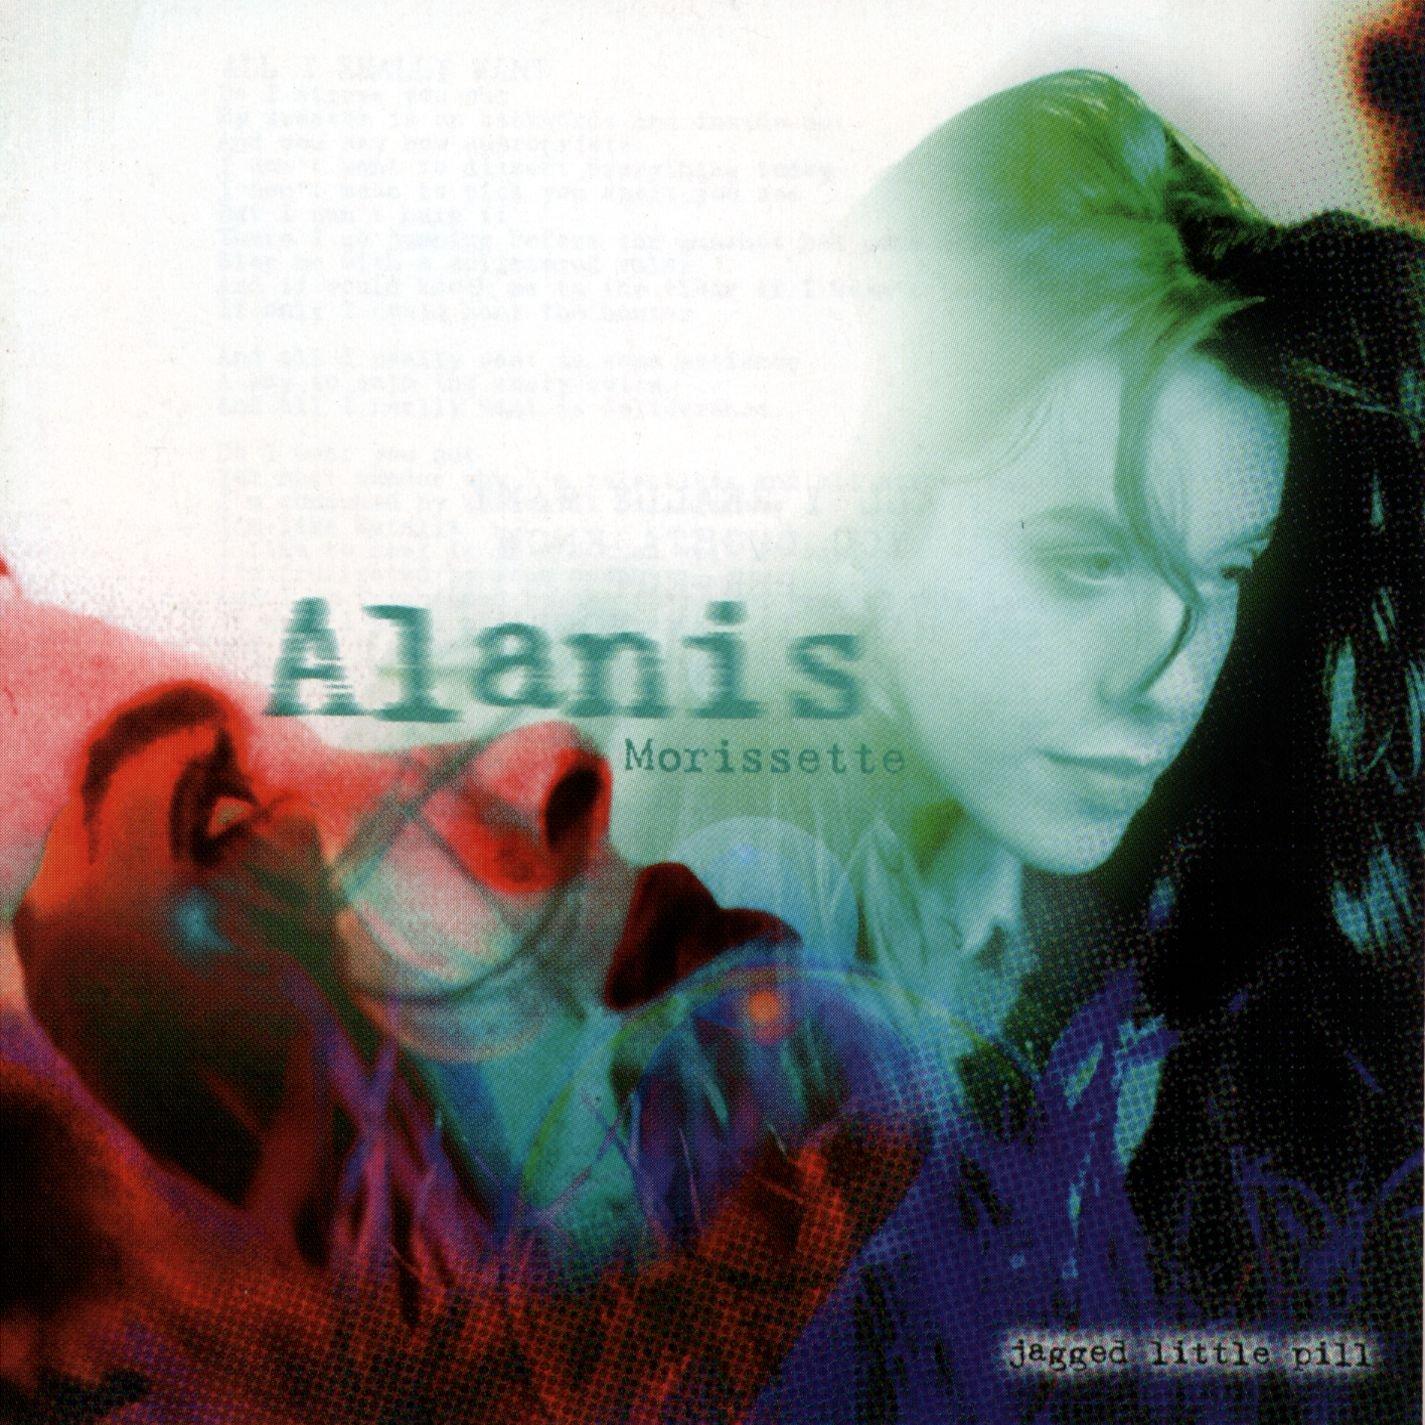 9.28 Alanis Morissette - Jagged Little Pill